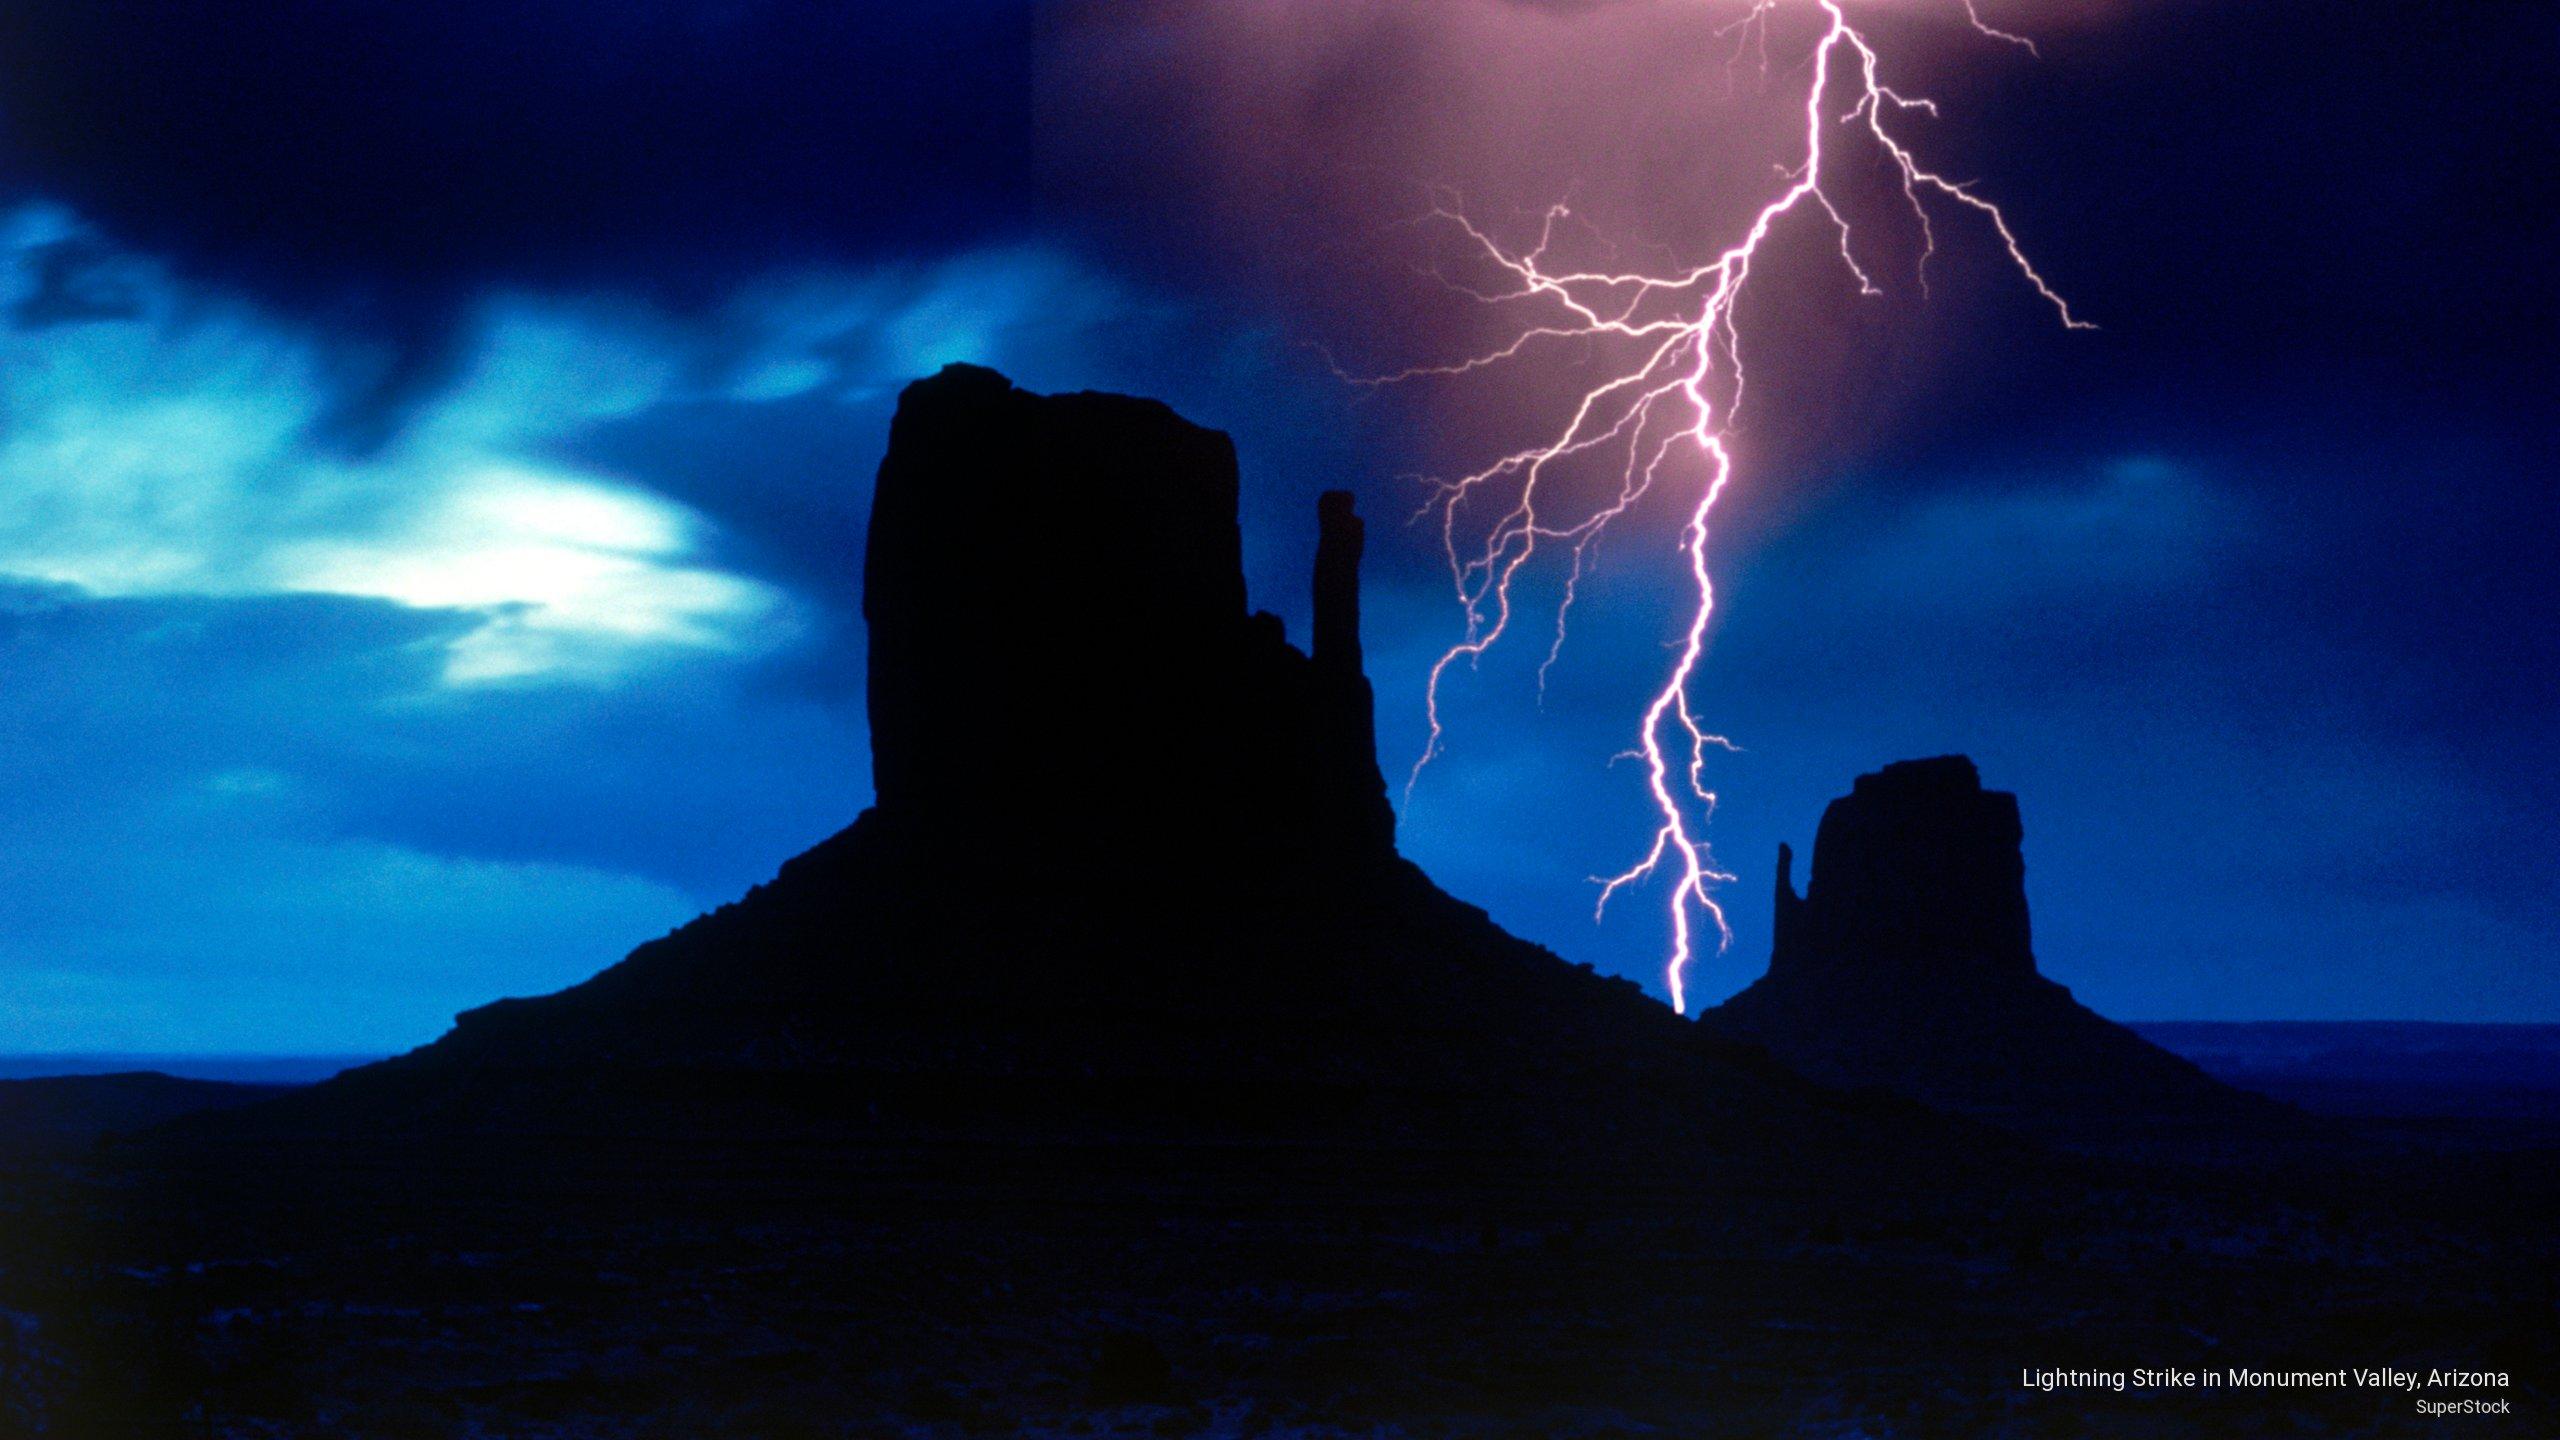 Lightning Strike in Monument Valley, Arizona